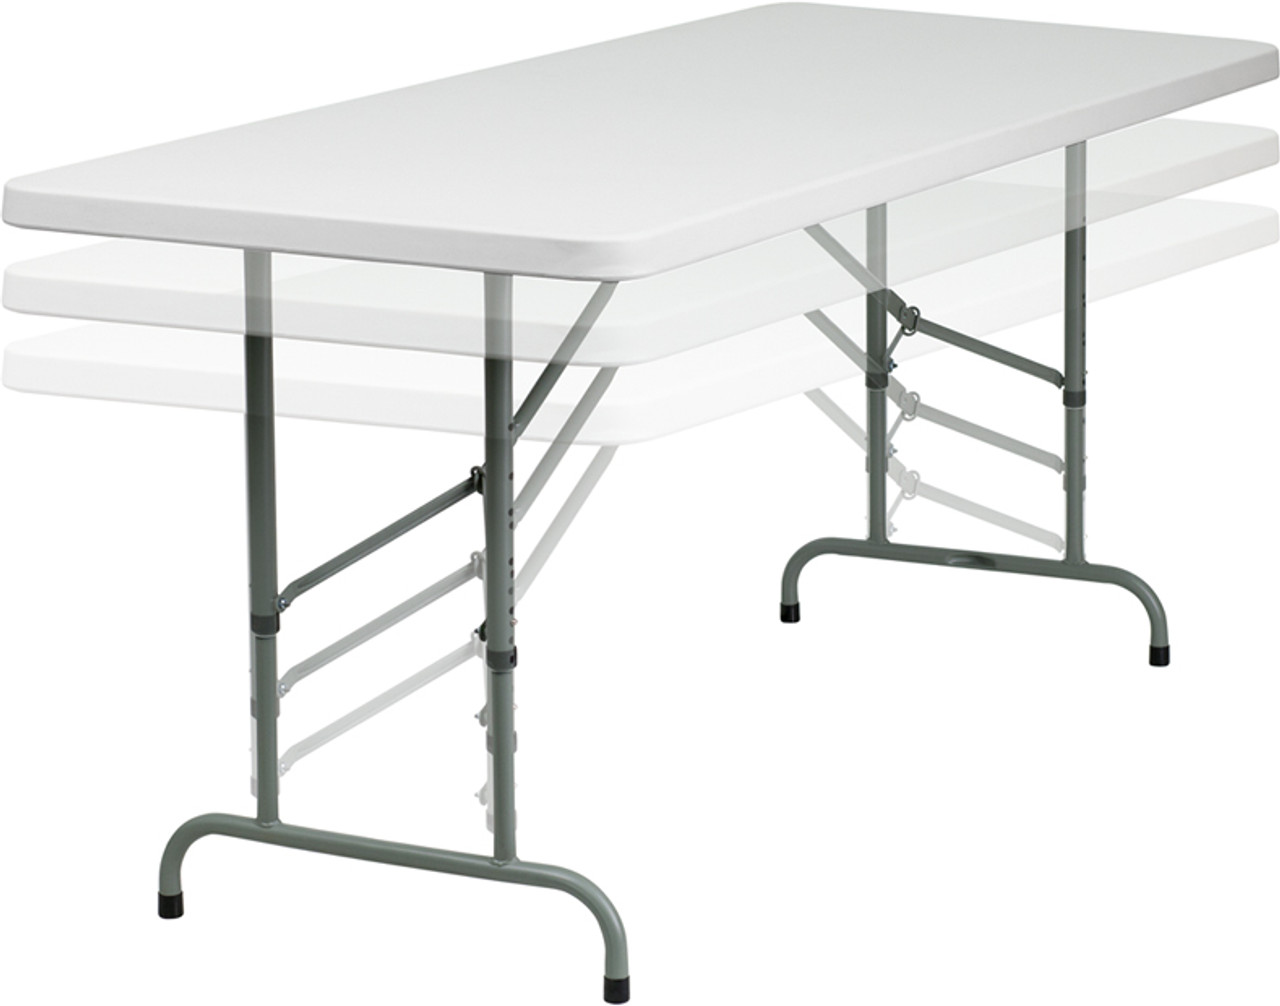 Rhinolite 30 X72 6 Ft Rectangle Plastic Folding Table Adjustable Height 22 32 H Solid One Piece Top Locking Steel Frame Foldingchairsandtables Com